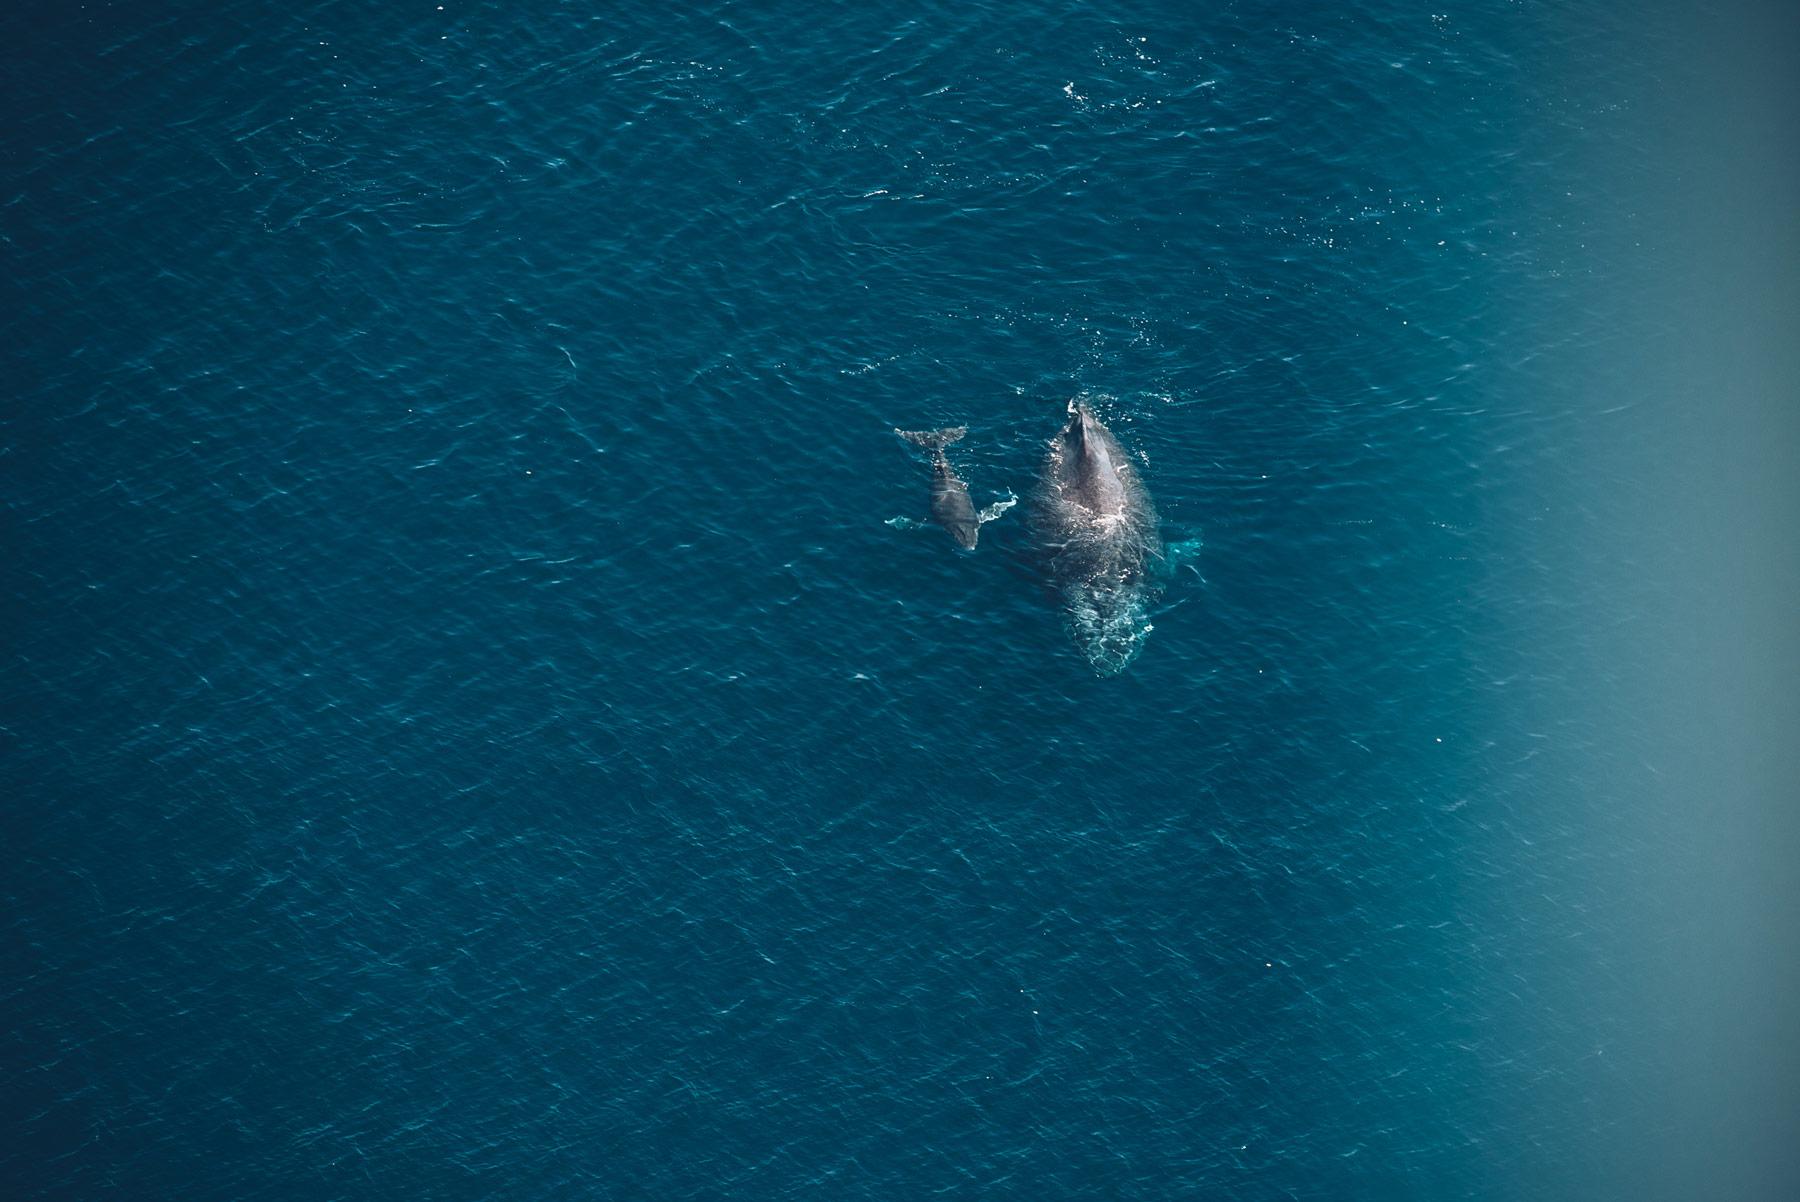 Baleines depuis les airs, Vol ULM avec TipTop, Mayotte